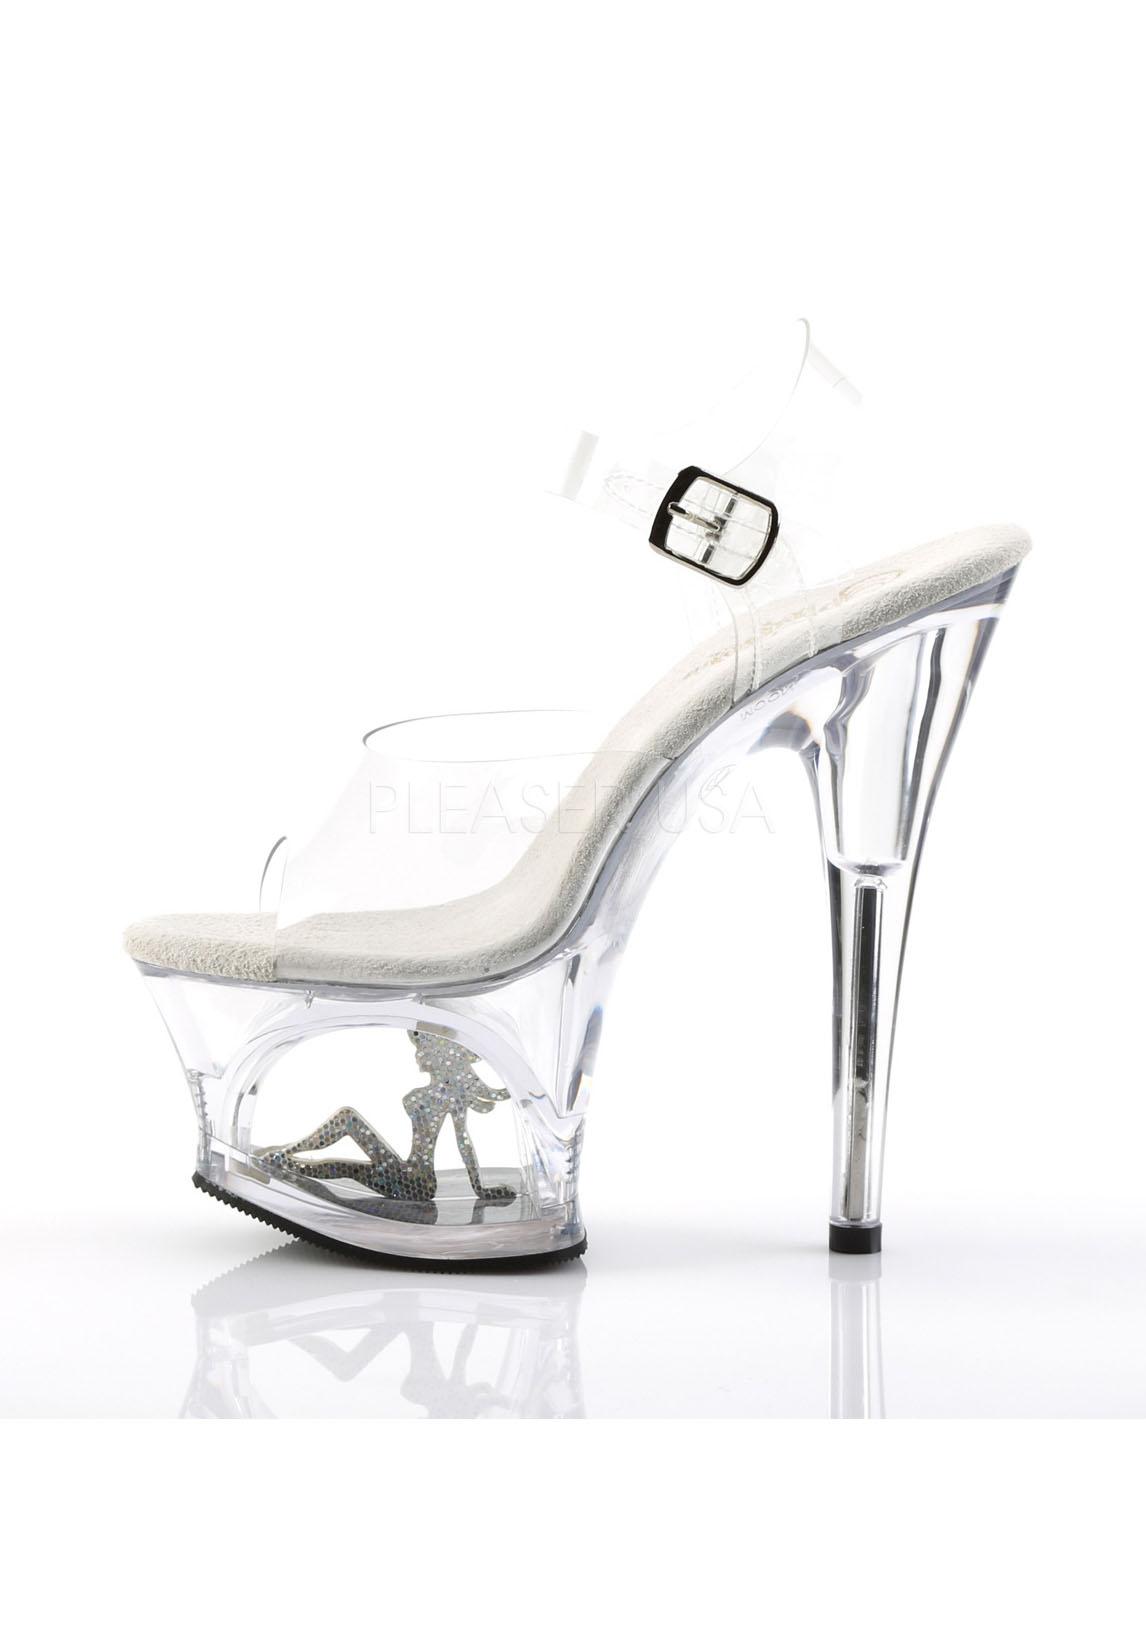 Pleaser MOON-708TG 7 Inch Heel, 2 3/4 Inch Cut-Out Platform Ankle Strap Sandale